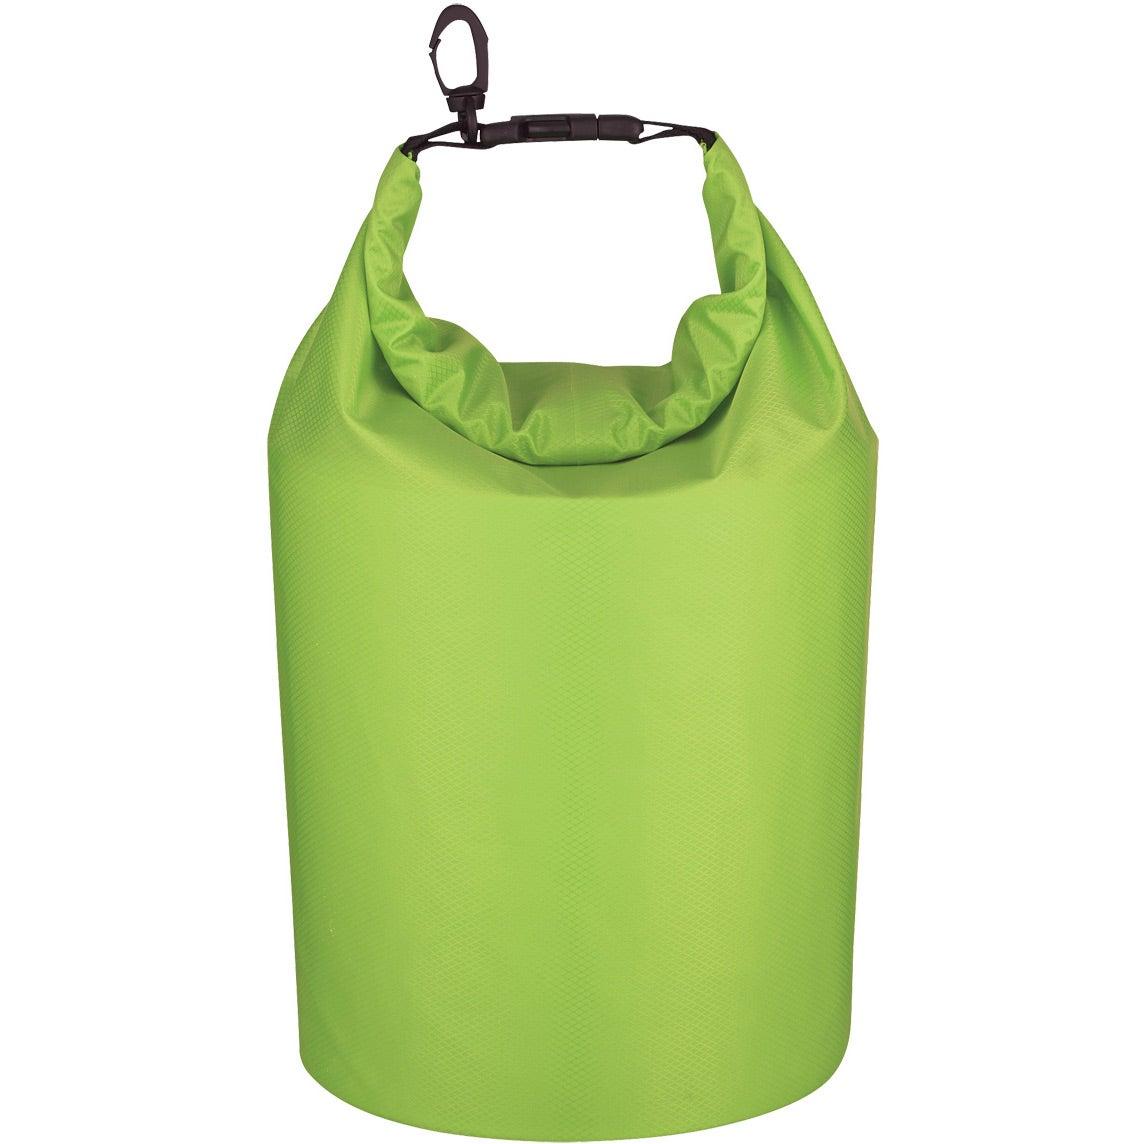 bde2e669de7d Waterproof Dry Bag